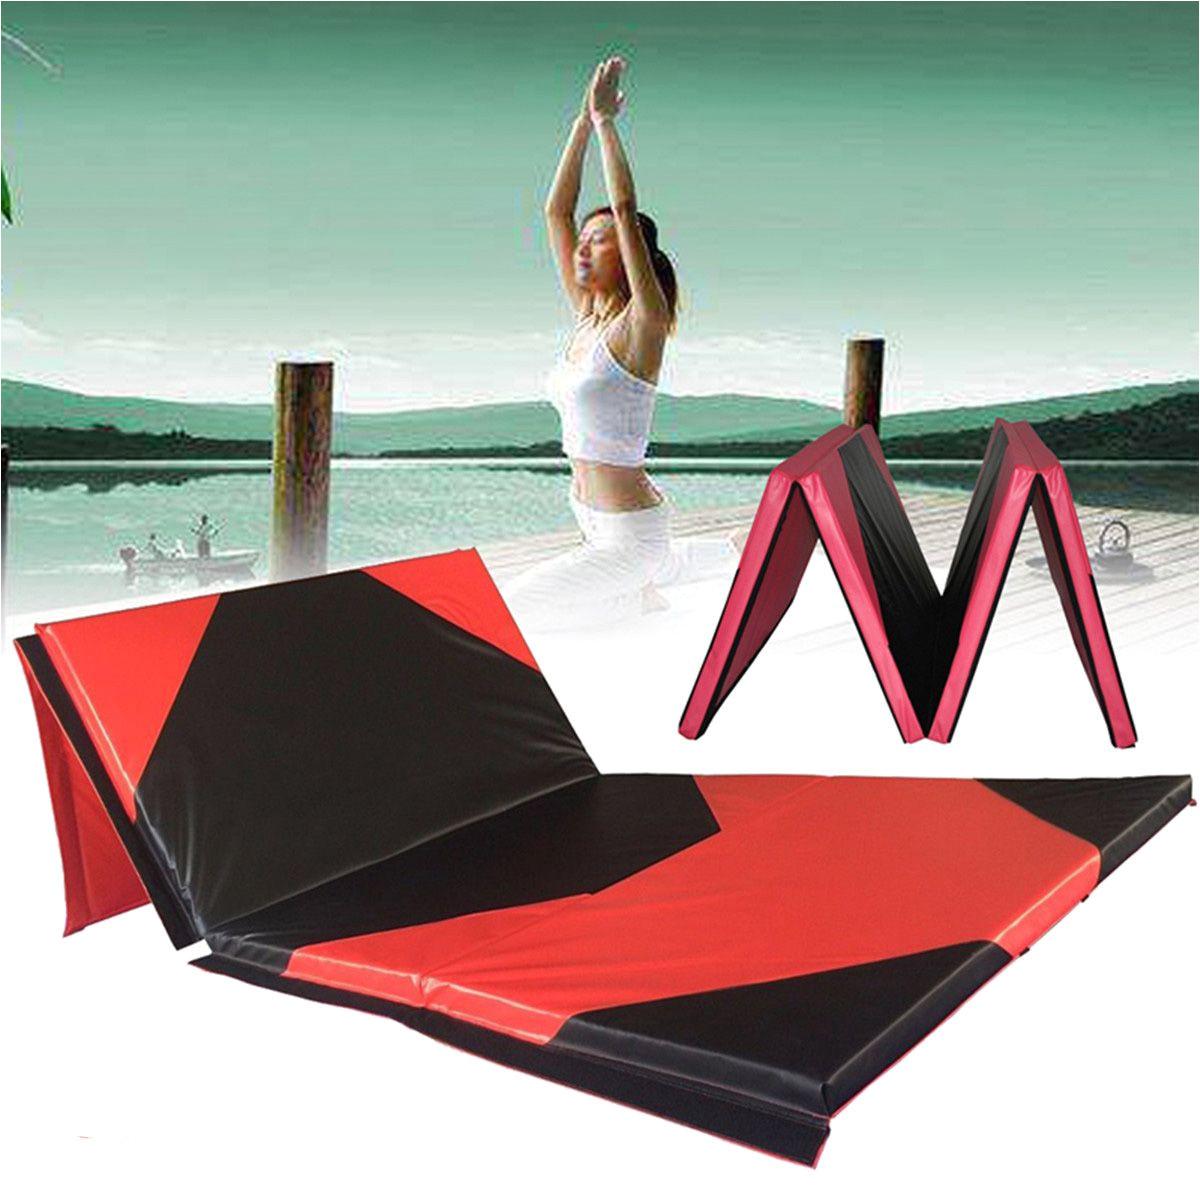 118x47x1 97inch gimnasia mat gym panel plegable yoga ejercicio tumbling aptitud pad